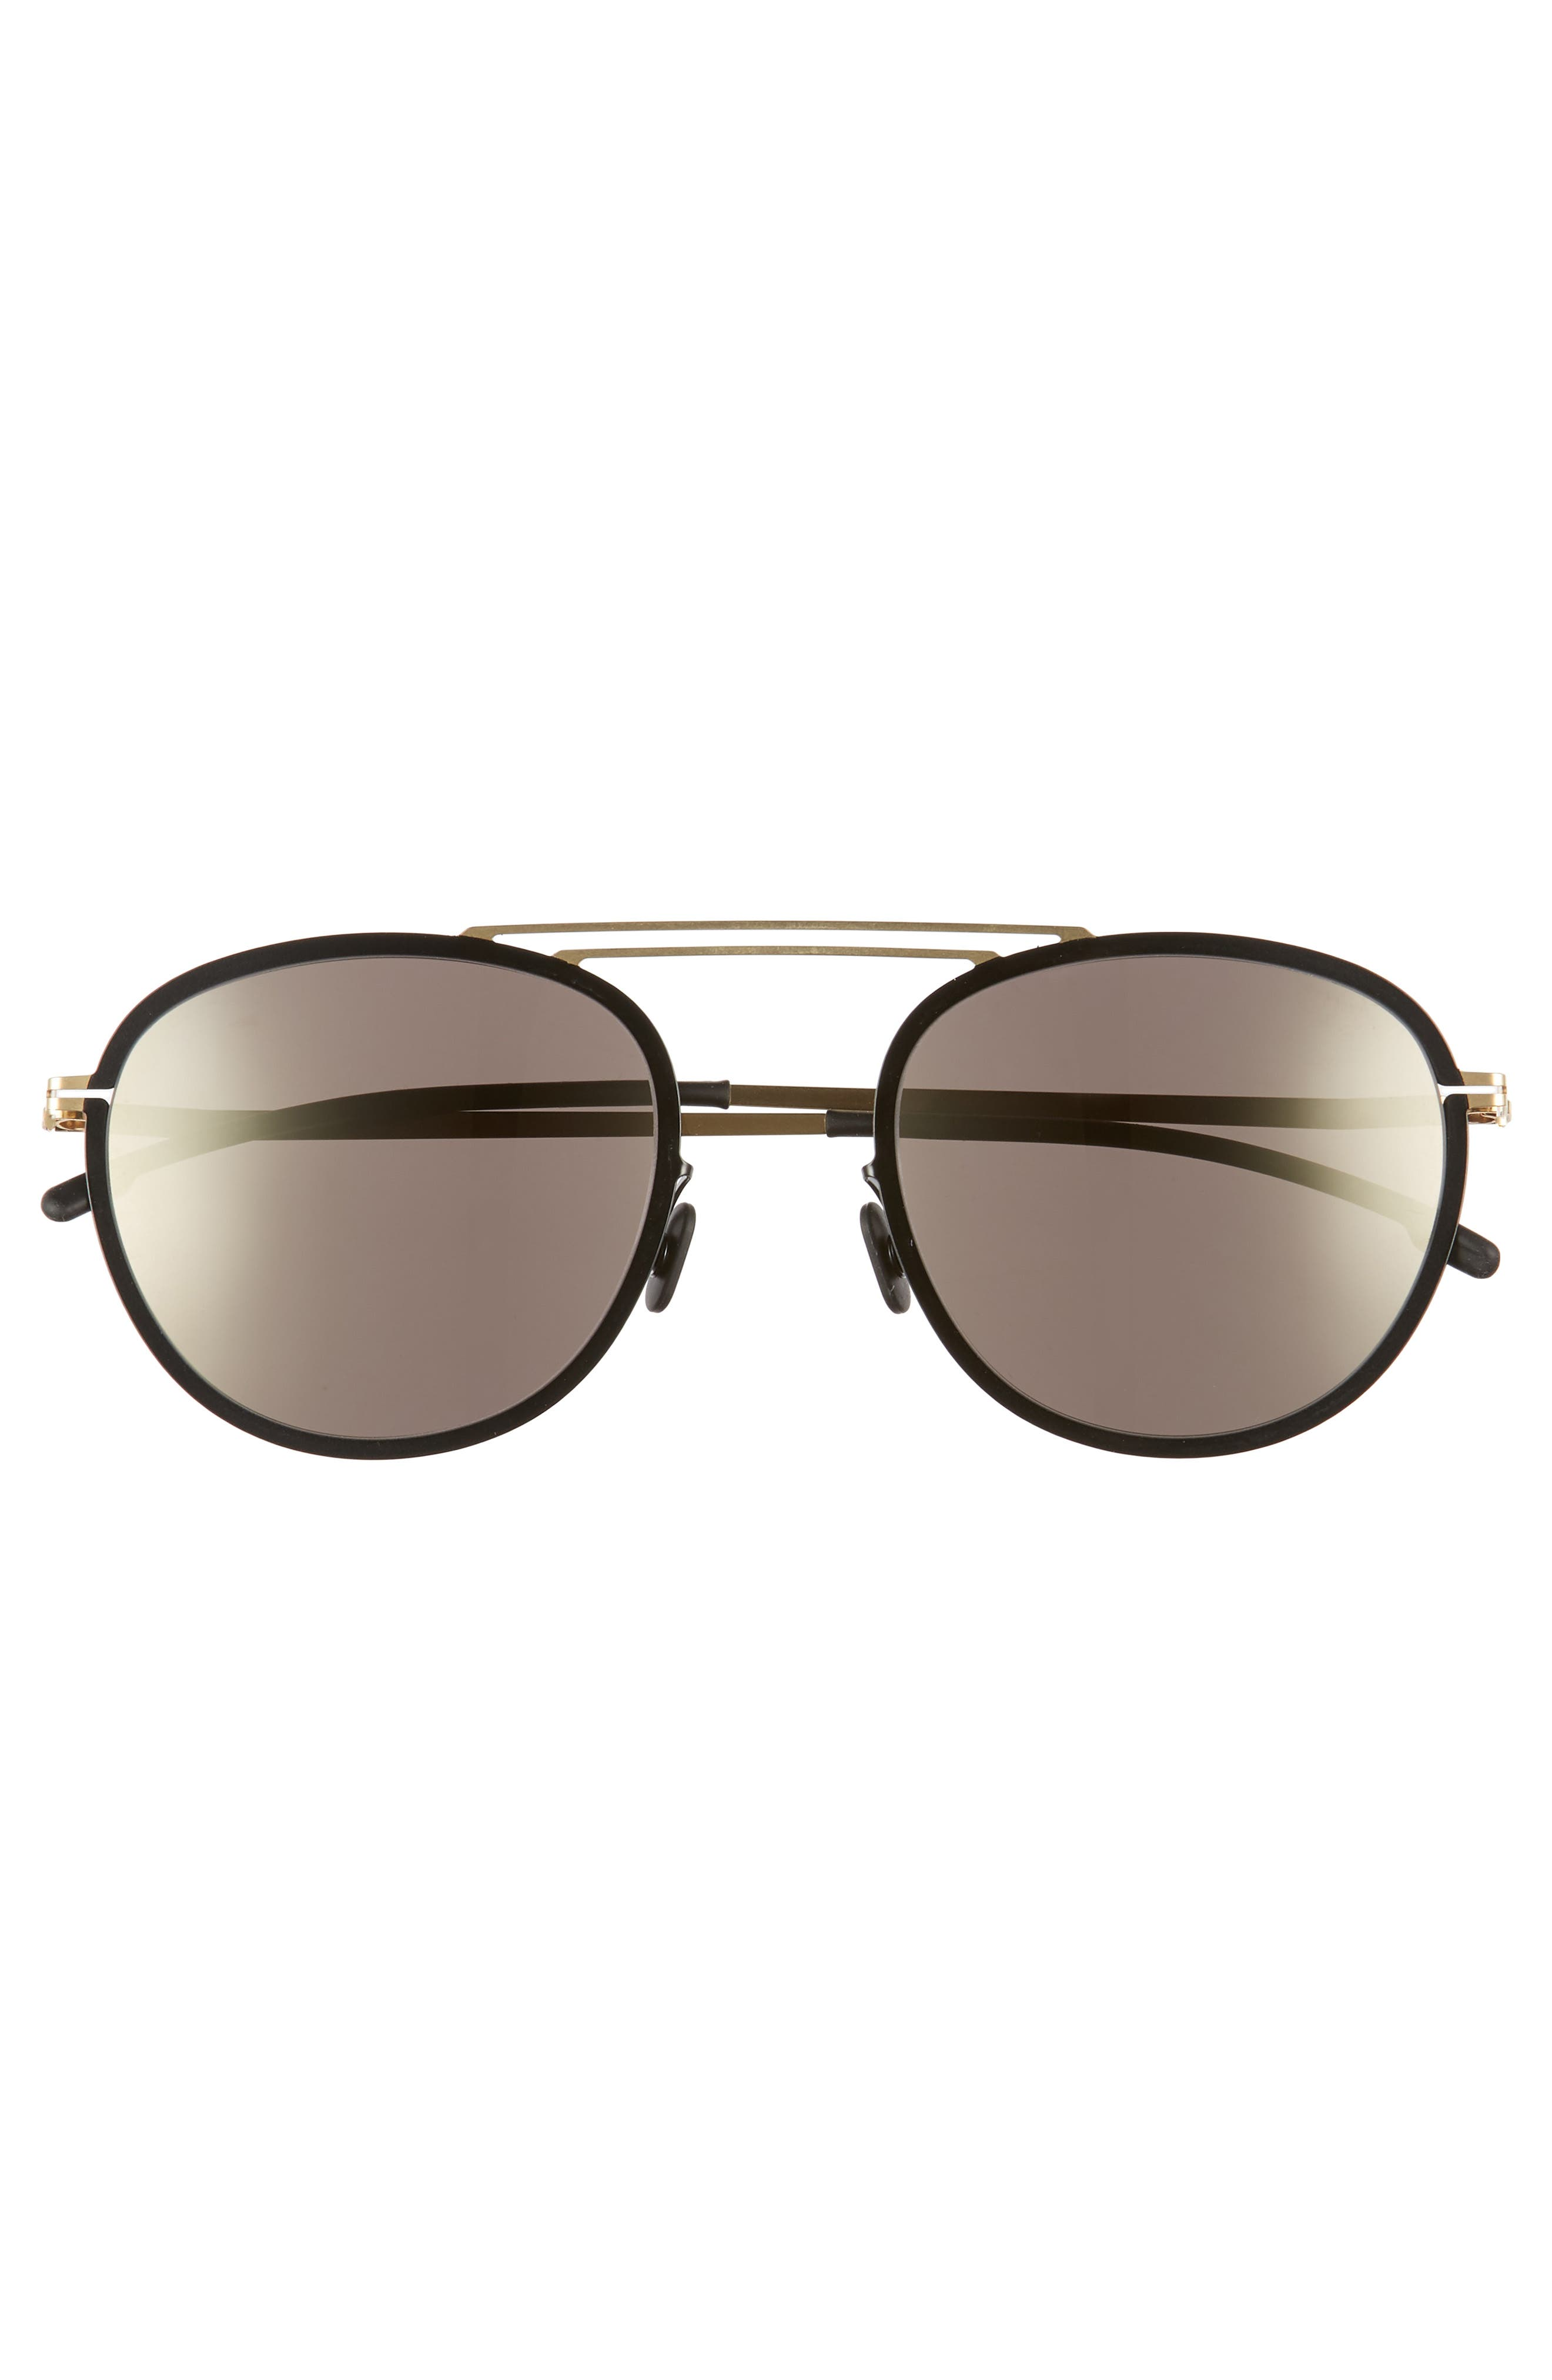 Luigi 52mm Aviator Sunglasses,                             Alternate thumbnail 2, color,                             Gold/ Jet Black